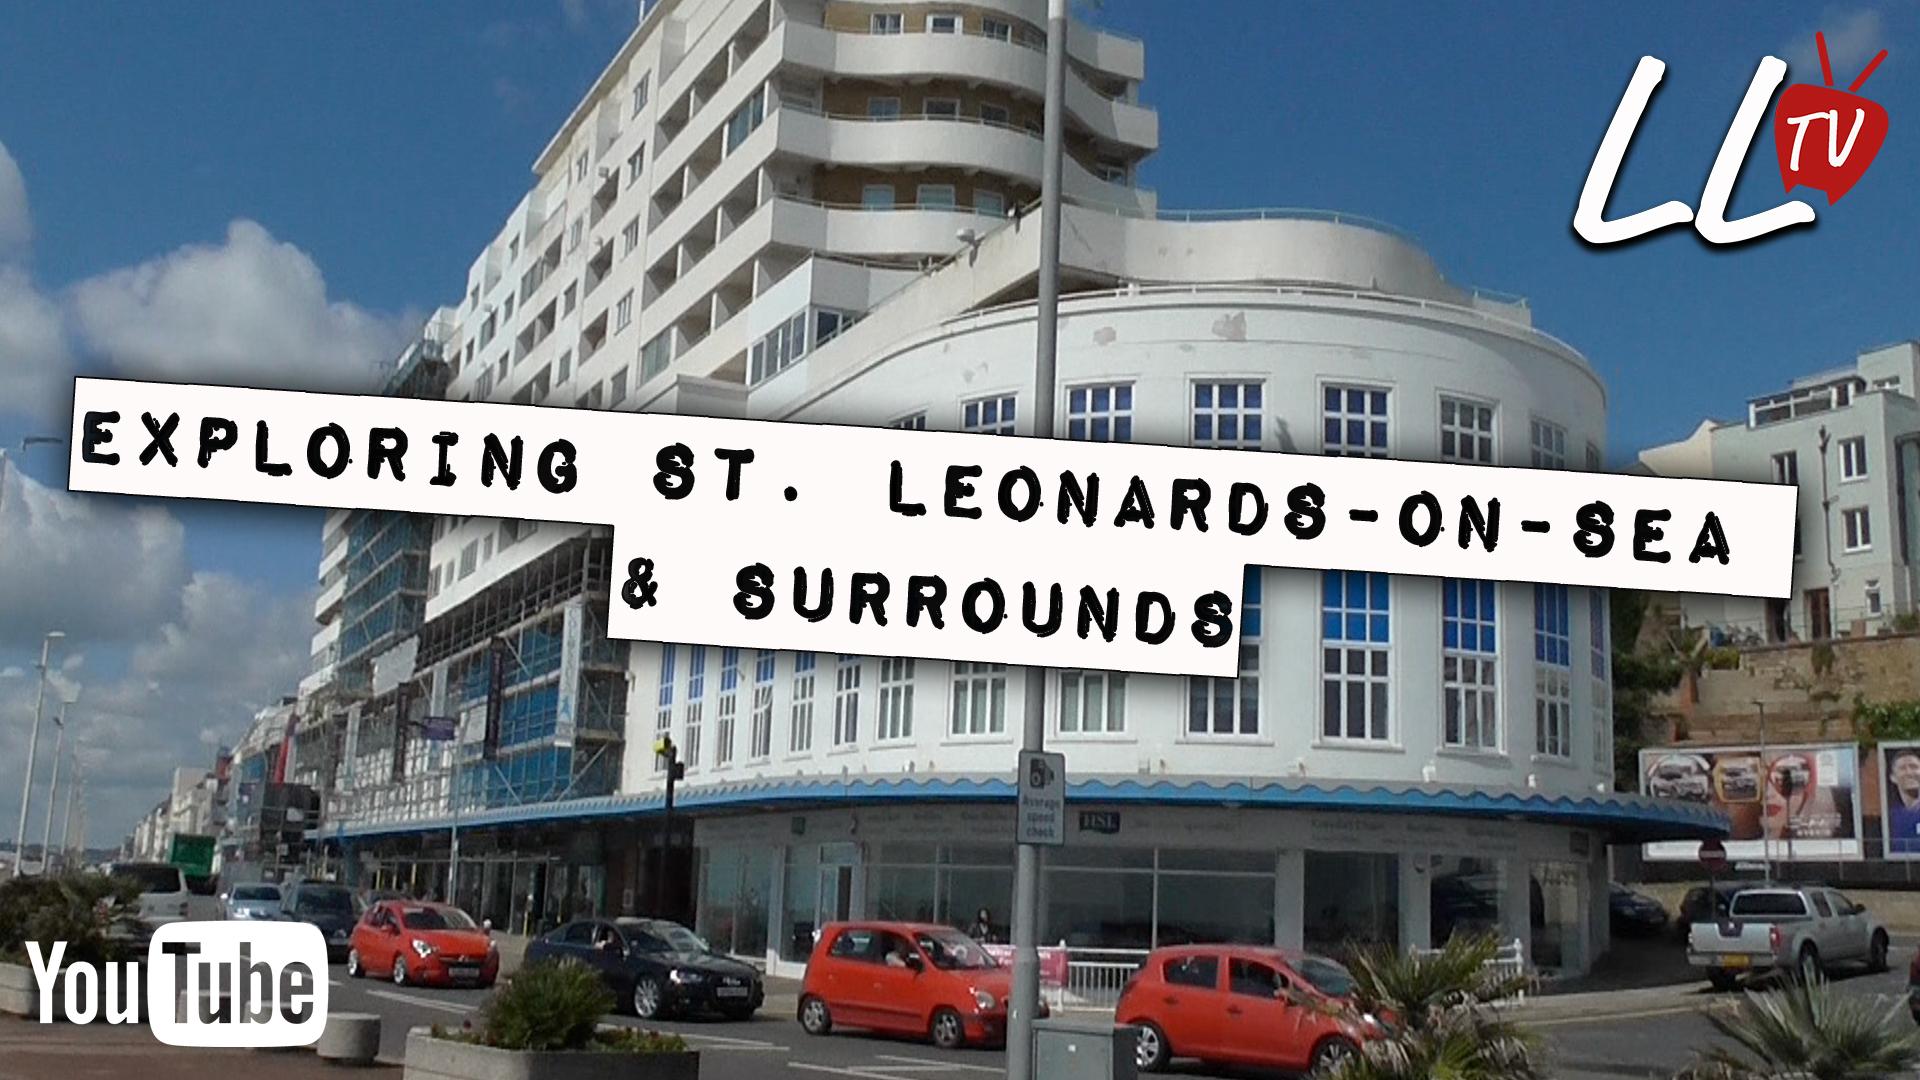 Exploring St. Leonards-on-Sea & Surrounds